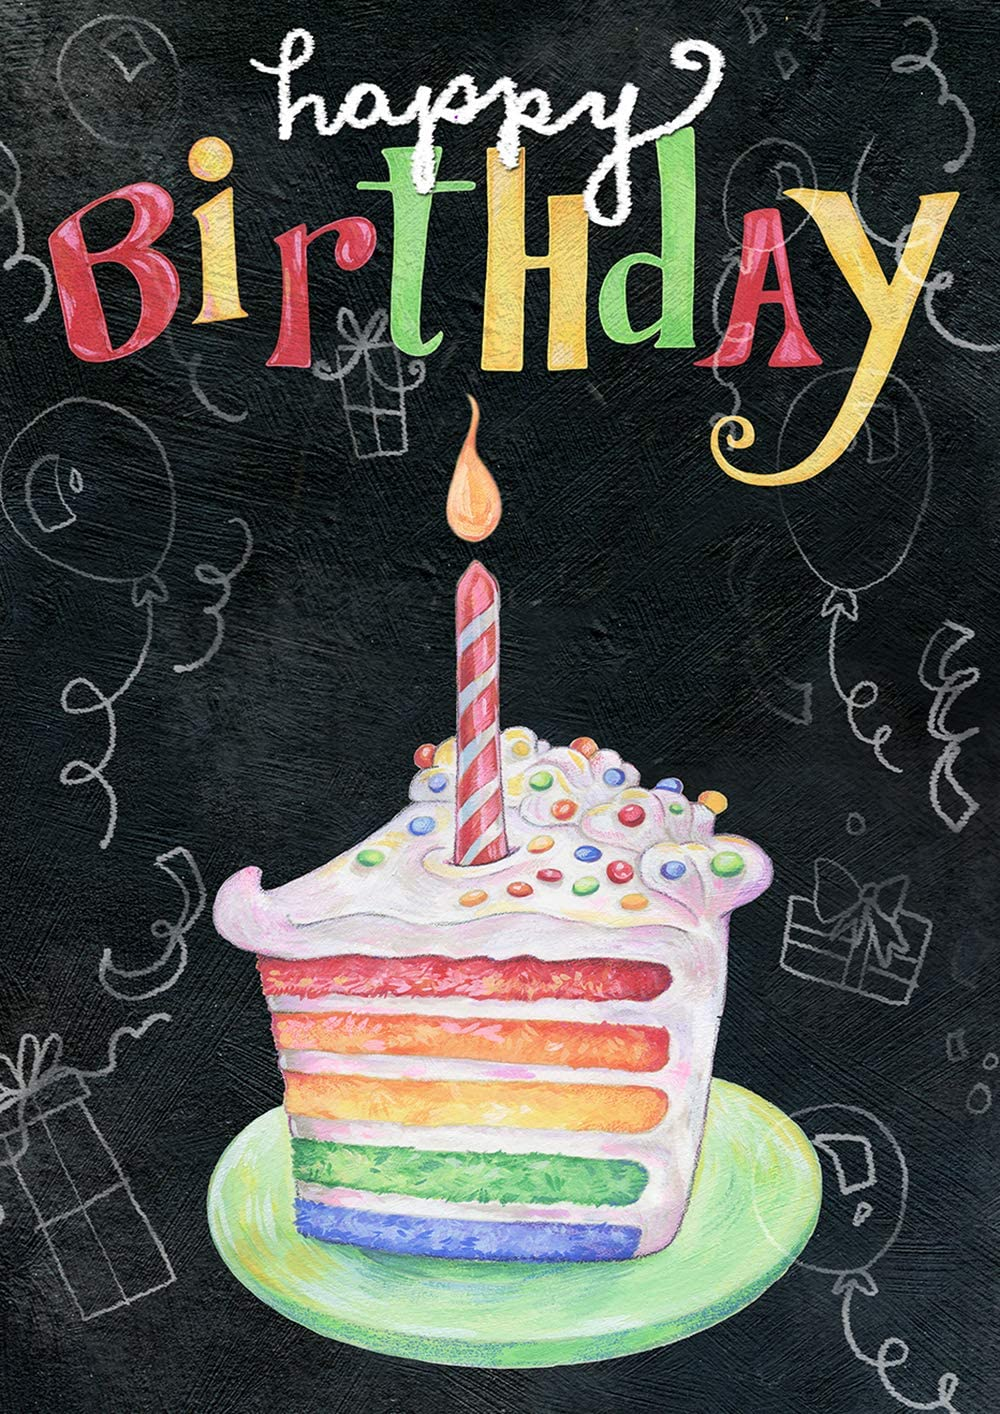 Toland Home Garden 1112277 Rainbow Cake Birthday 12.5 x 18 Inch Decorative, Happy Chalkboard Celebration, Double Sided Garden Flag